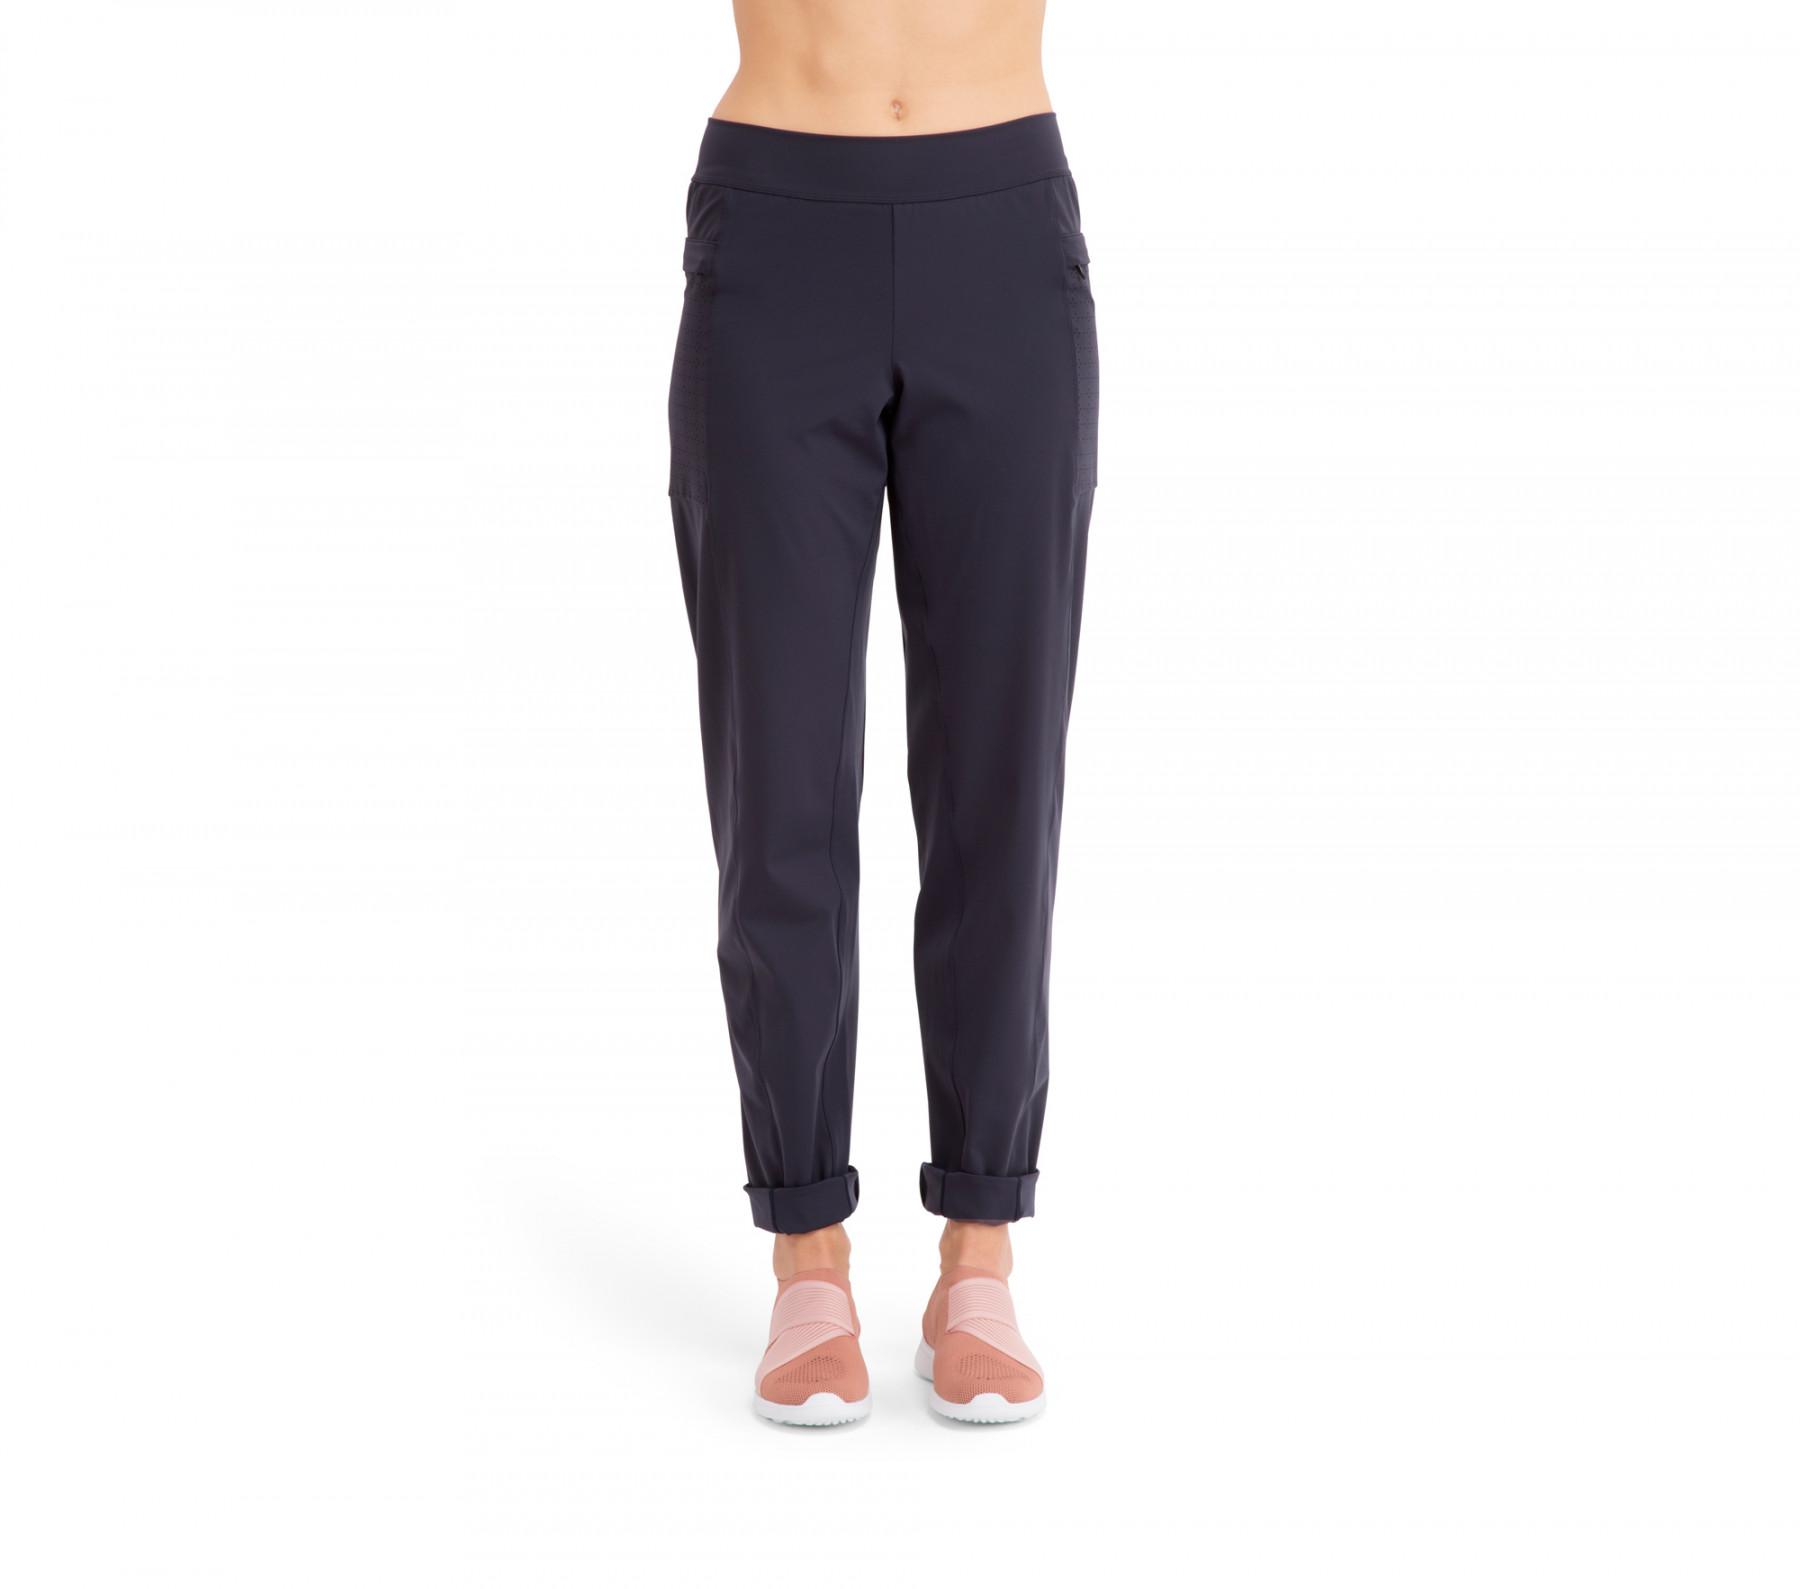 Pantaloni tecnici high stretch